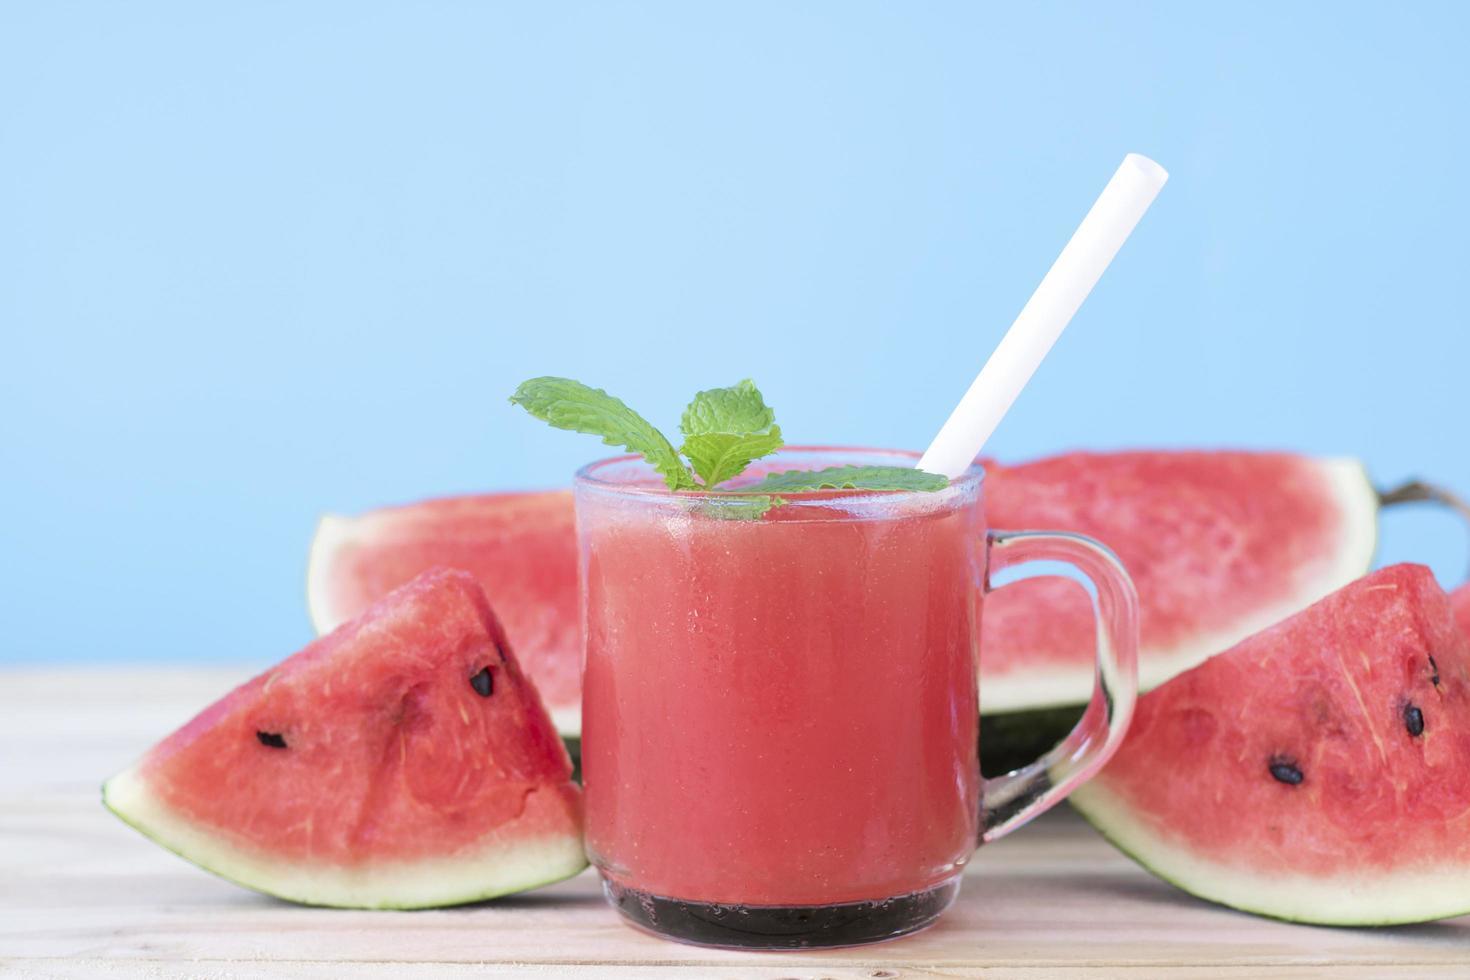 bevanda e fette di anguria su sfondo blu foto